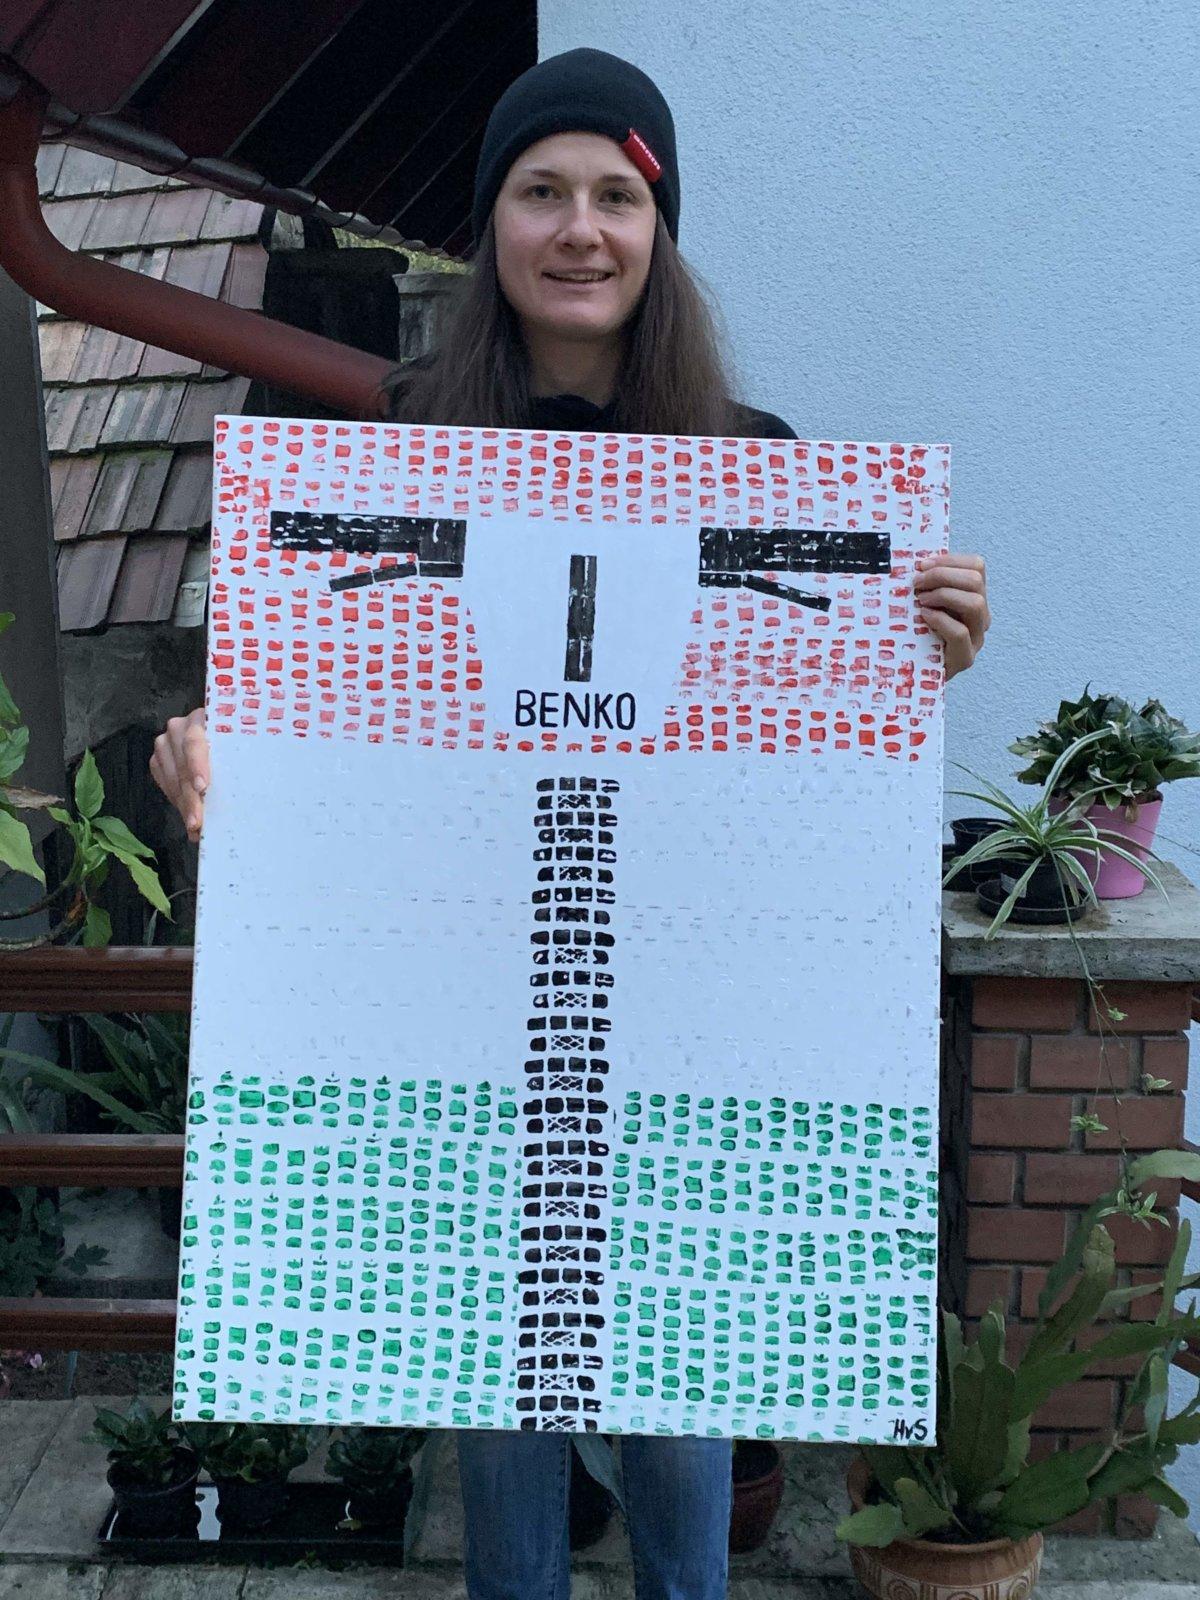 Barbara Benko Mountainbike Champion Hungary Painting By Hubert Decreatievelink Van Soest